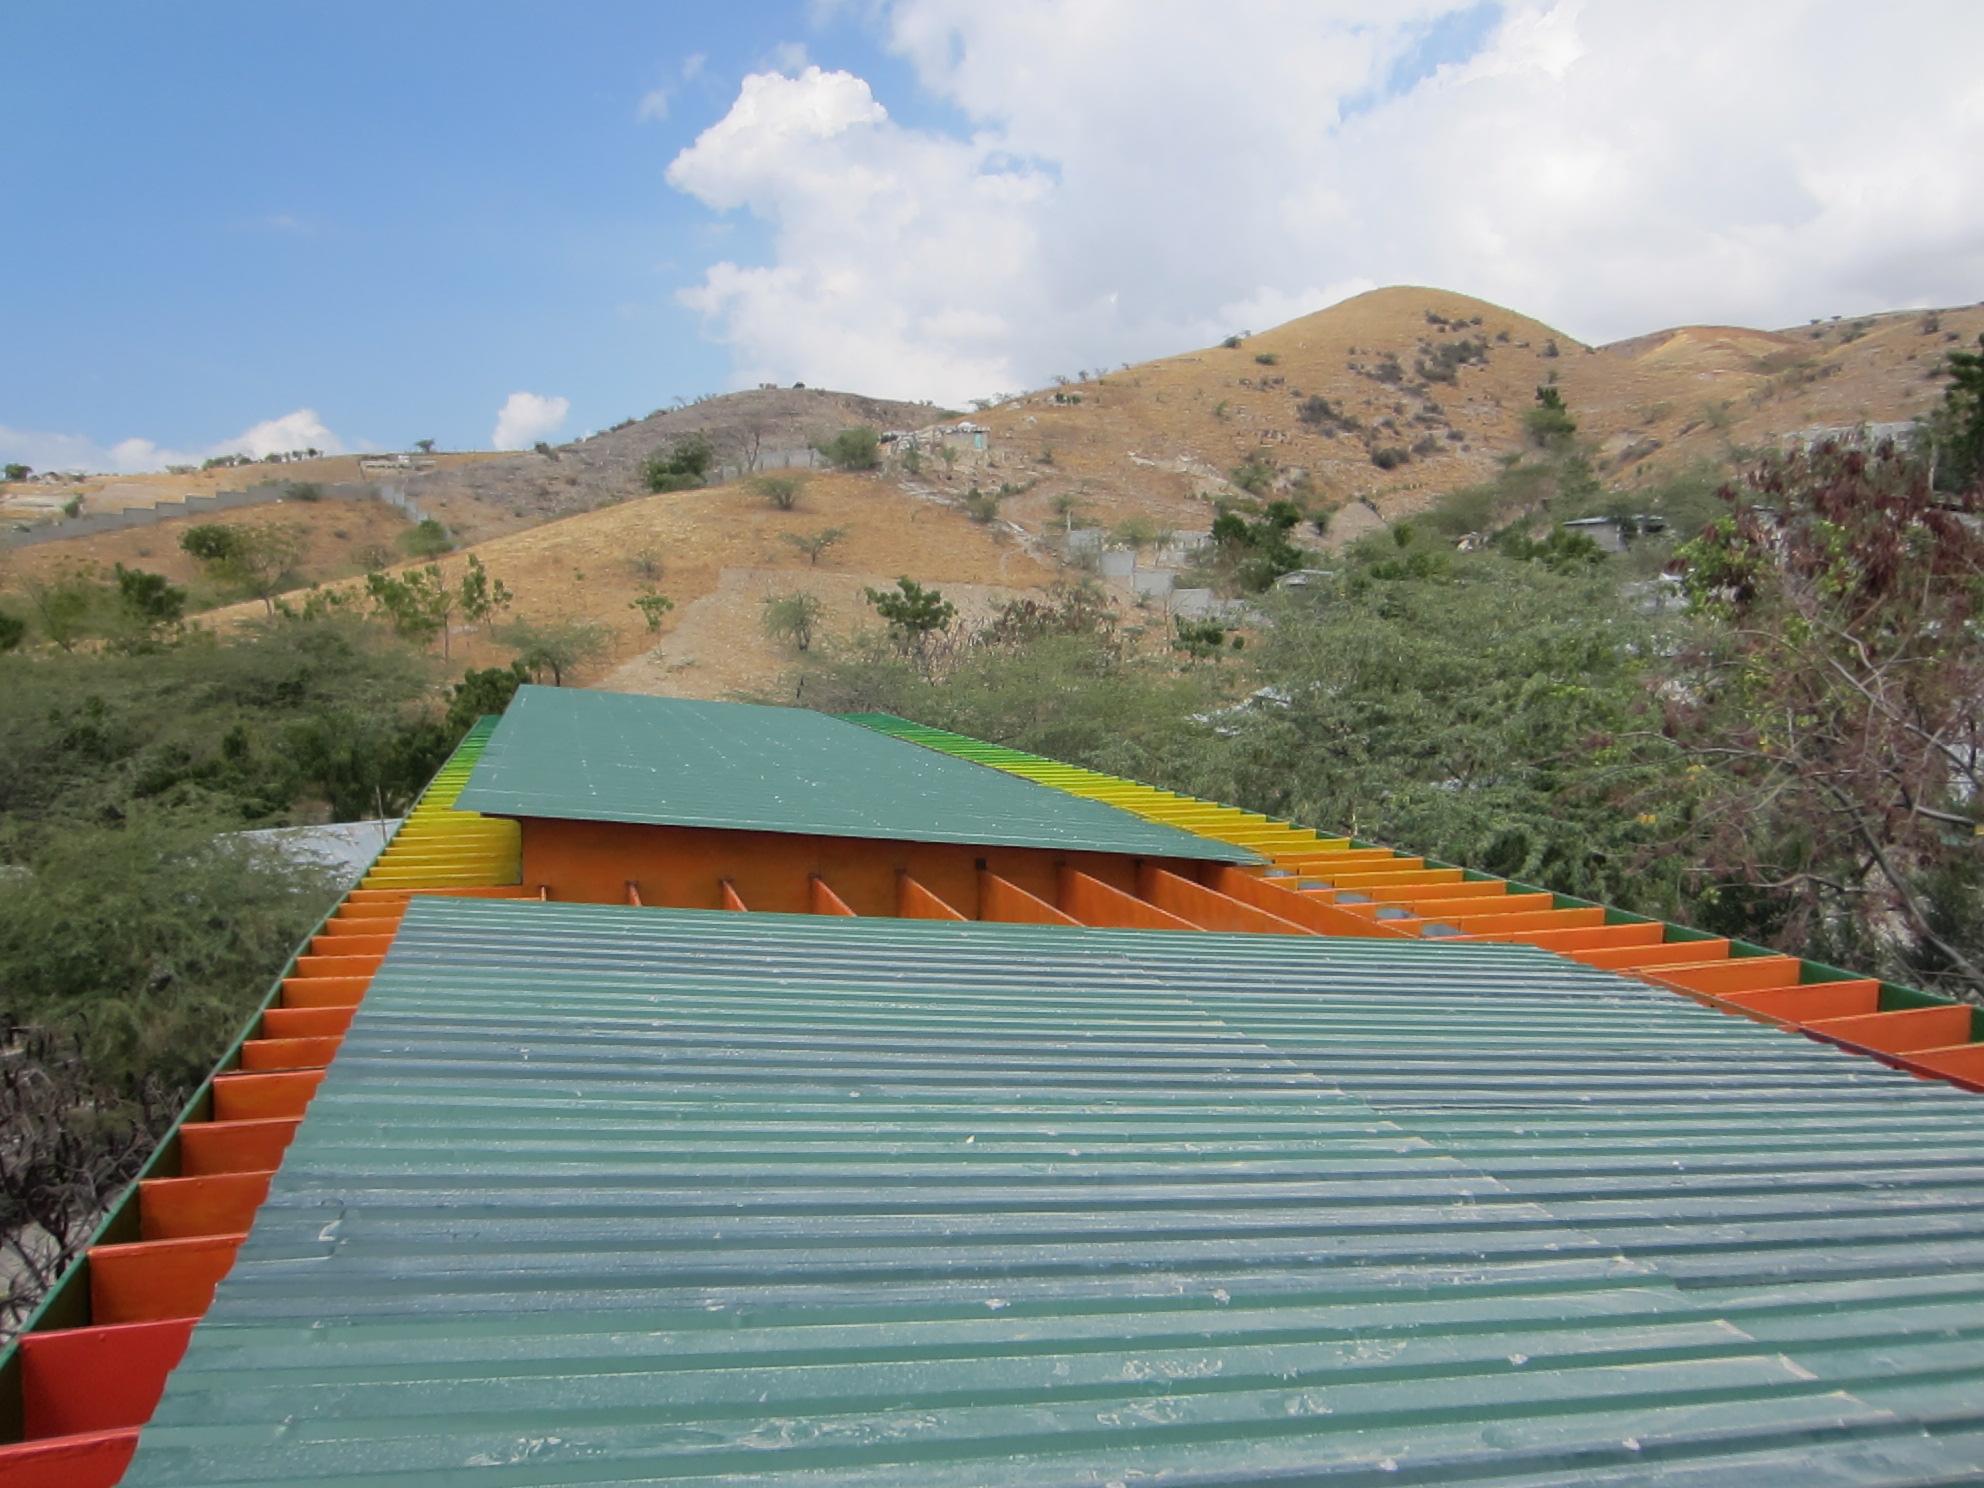 2012-07-09-roof.JPG